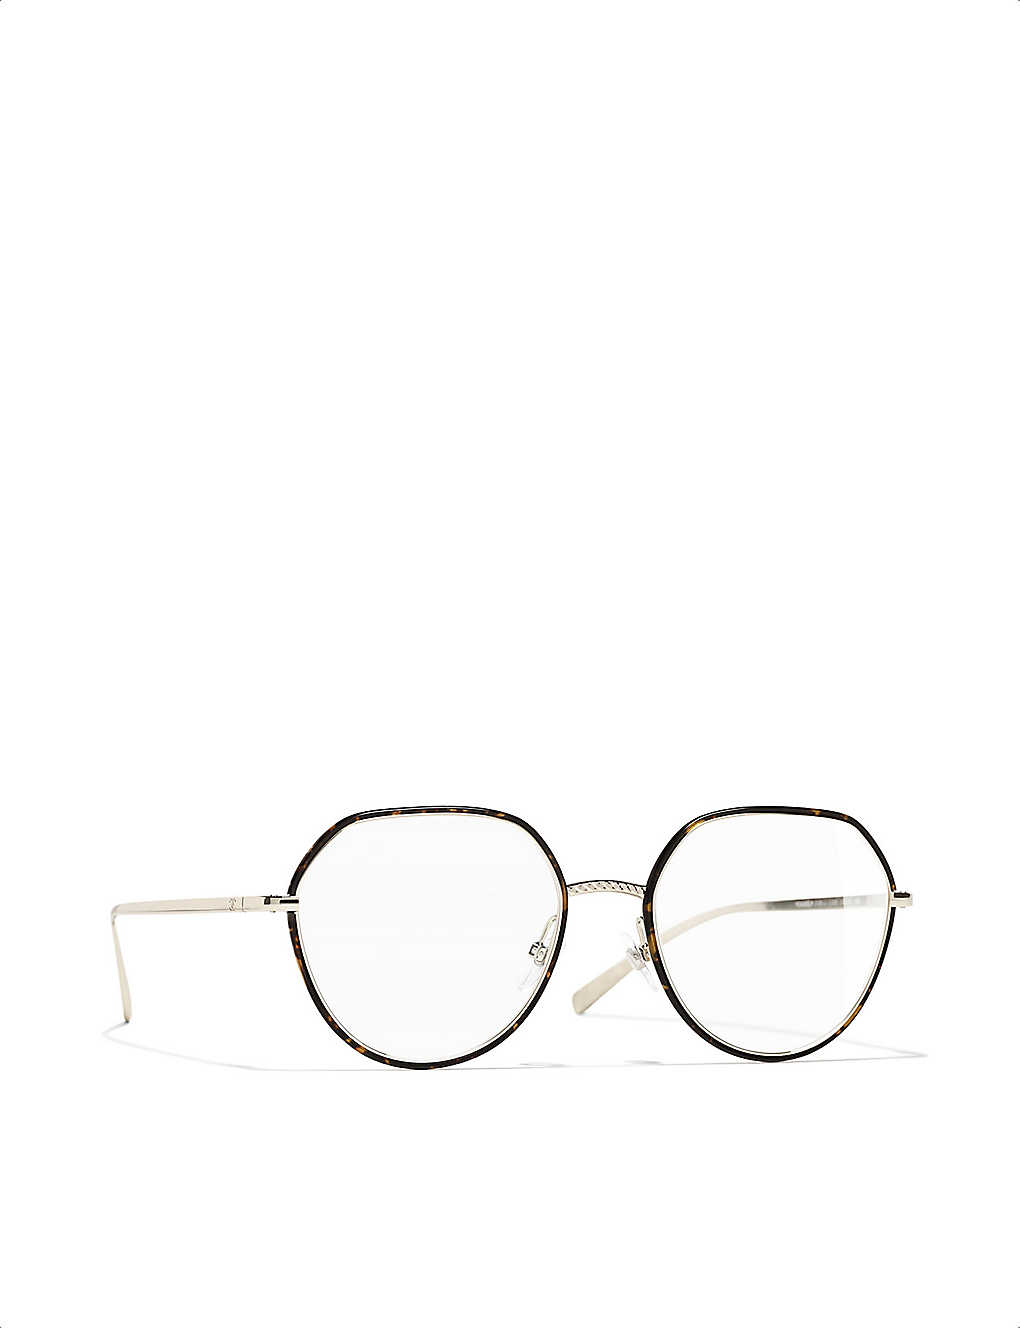 CHANEL: Irregular metal glasses